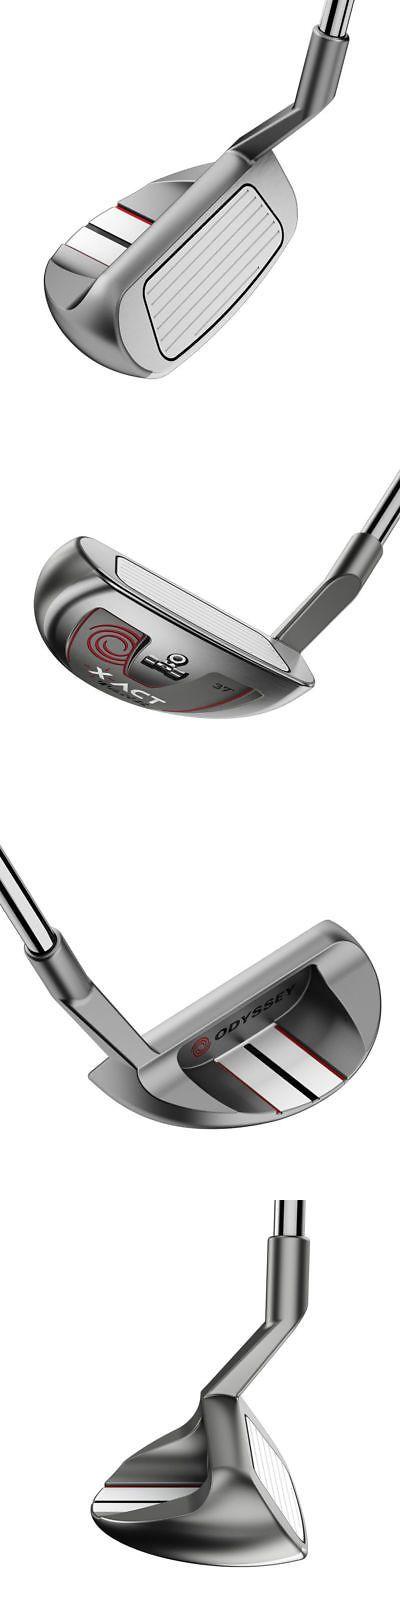 Golf Clubs 115280: Odyssey X-Act Tank Chipper 35.5 Length 37* Loft W Super Stroke Grip -New -> BUY IT NOW ONLY: $122.95 on eBay!